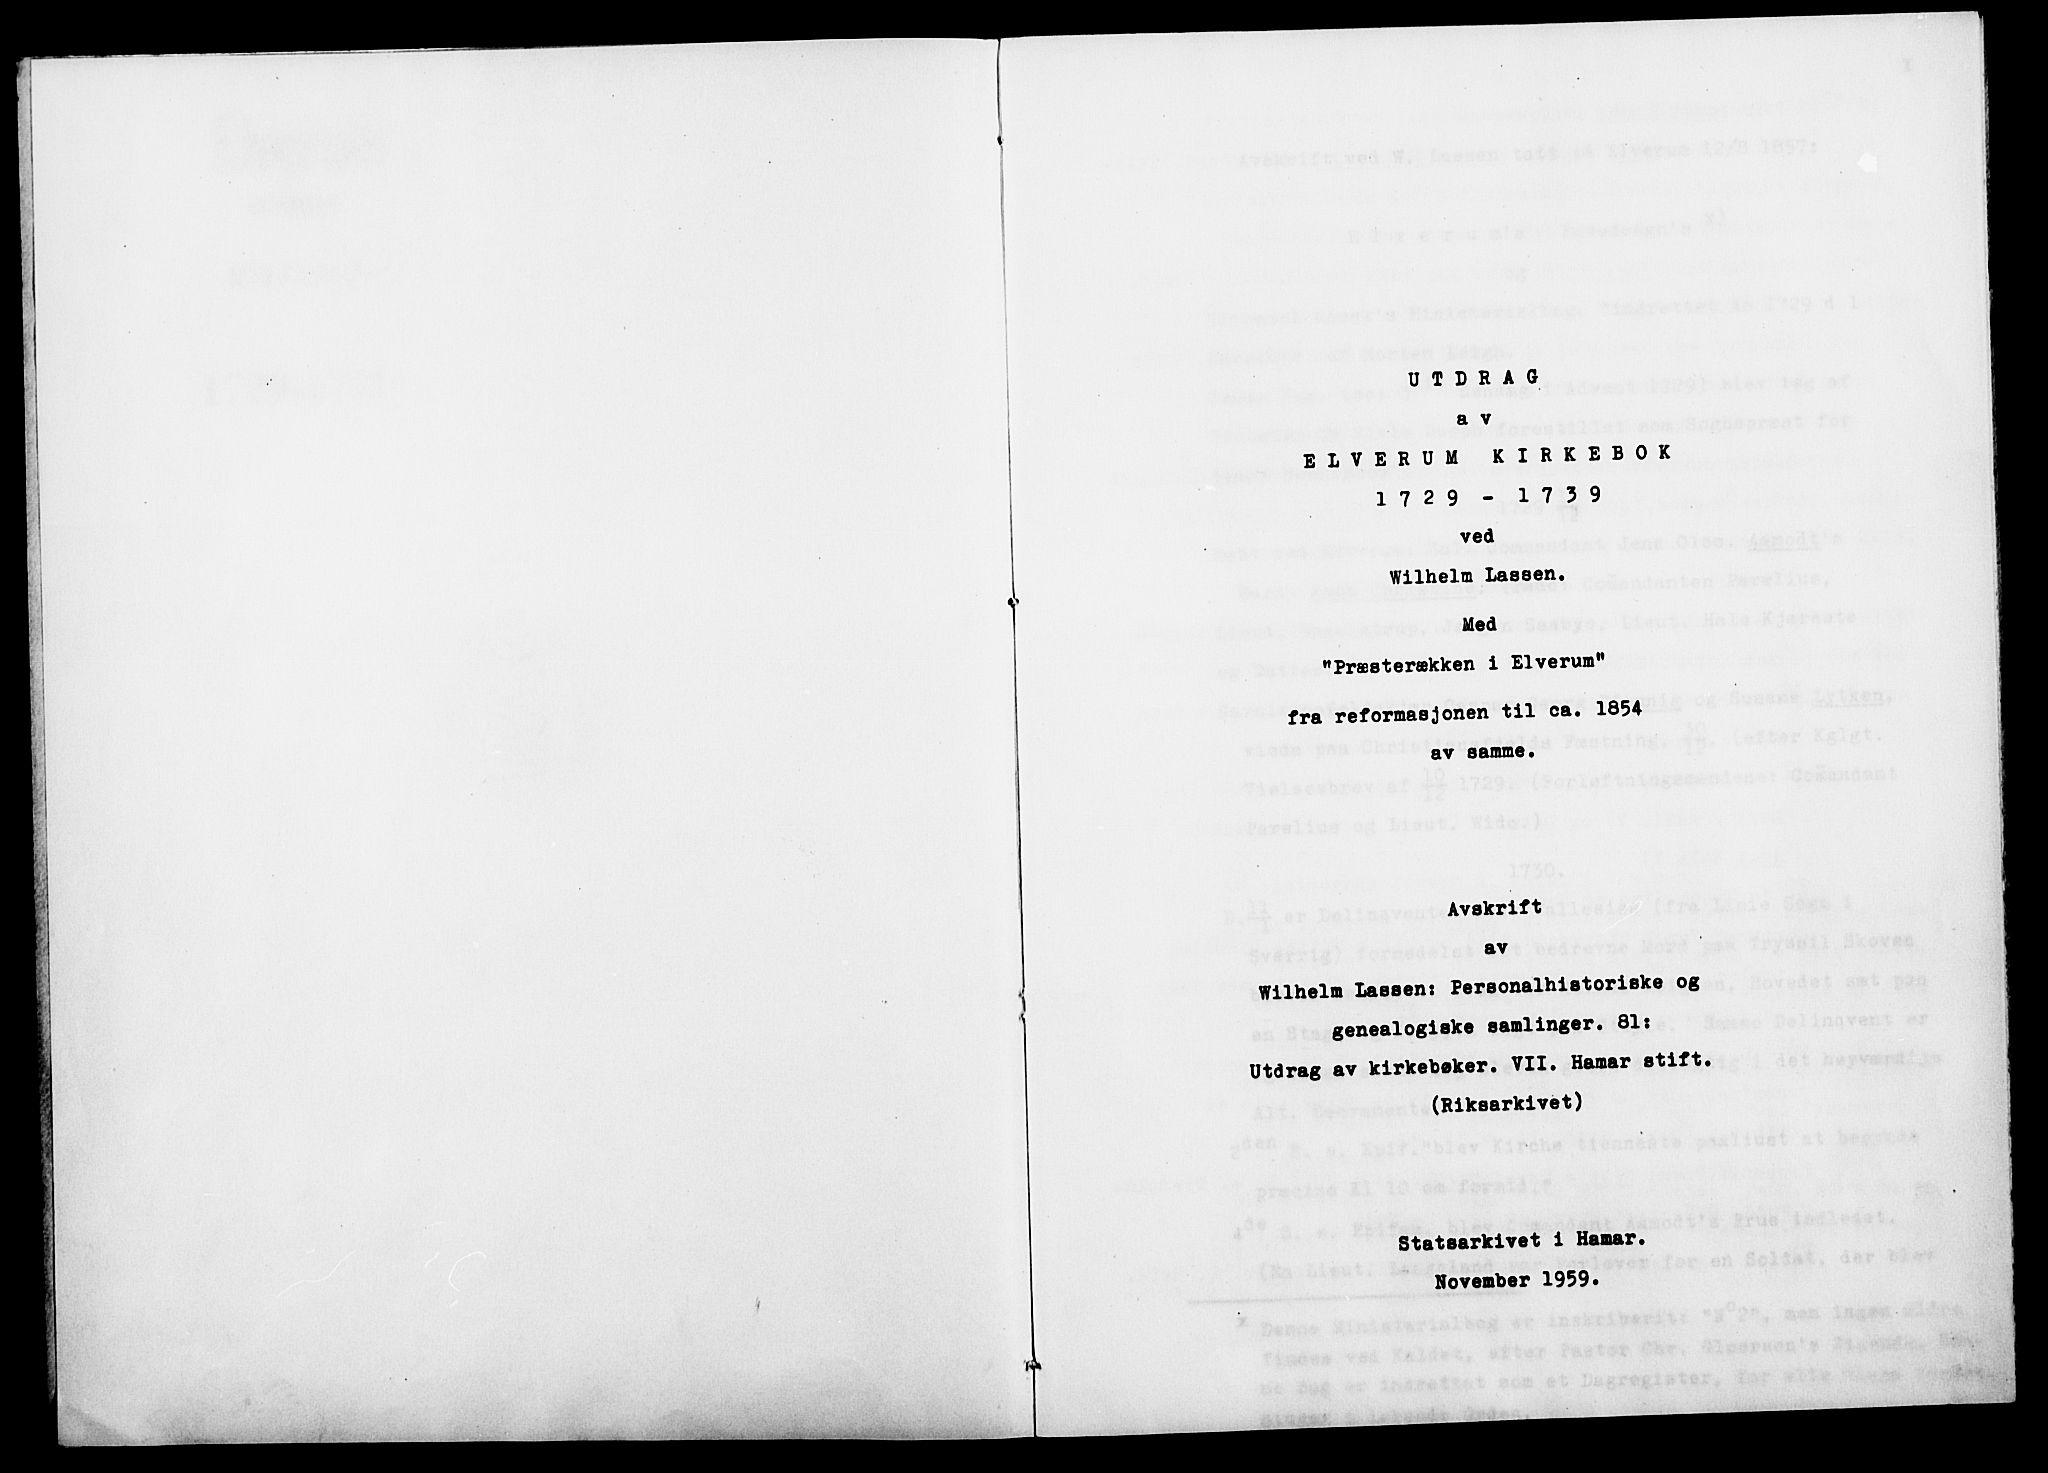 SAH, Elverum prestekontor, H/Ha/Haa/L0000: Ministerialbok, 1729-1739